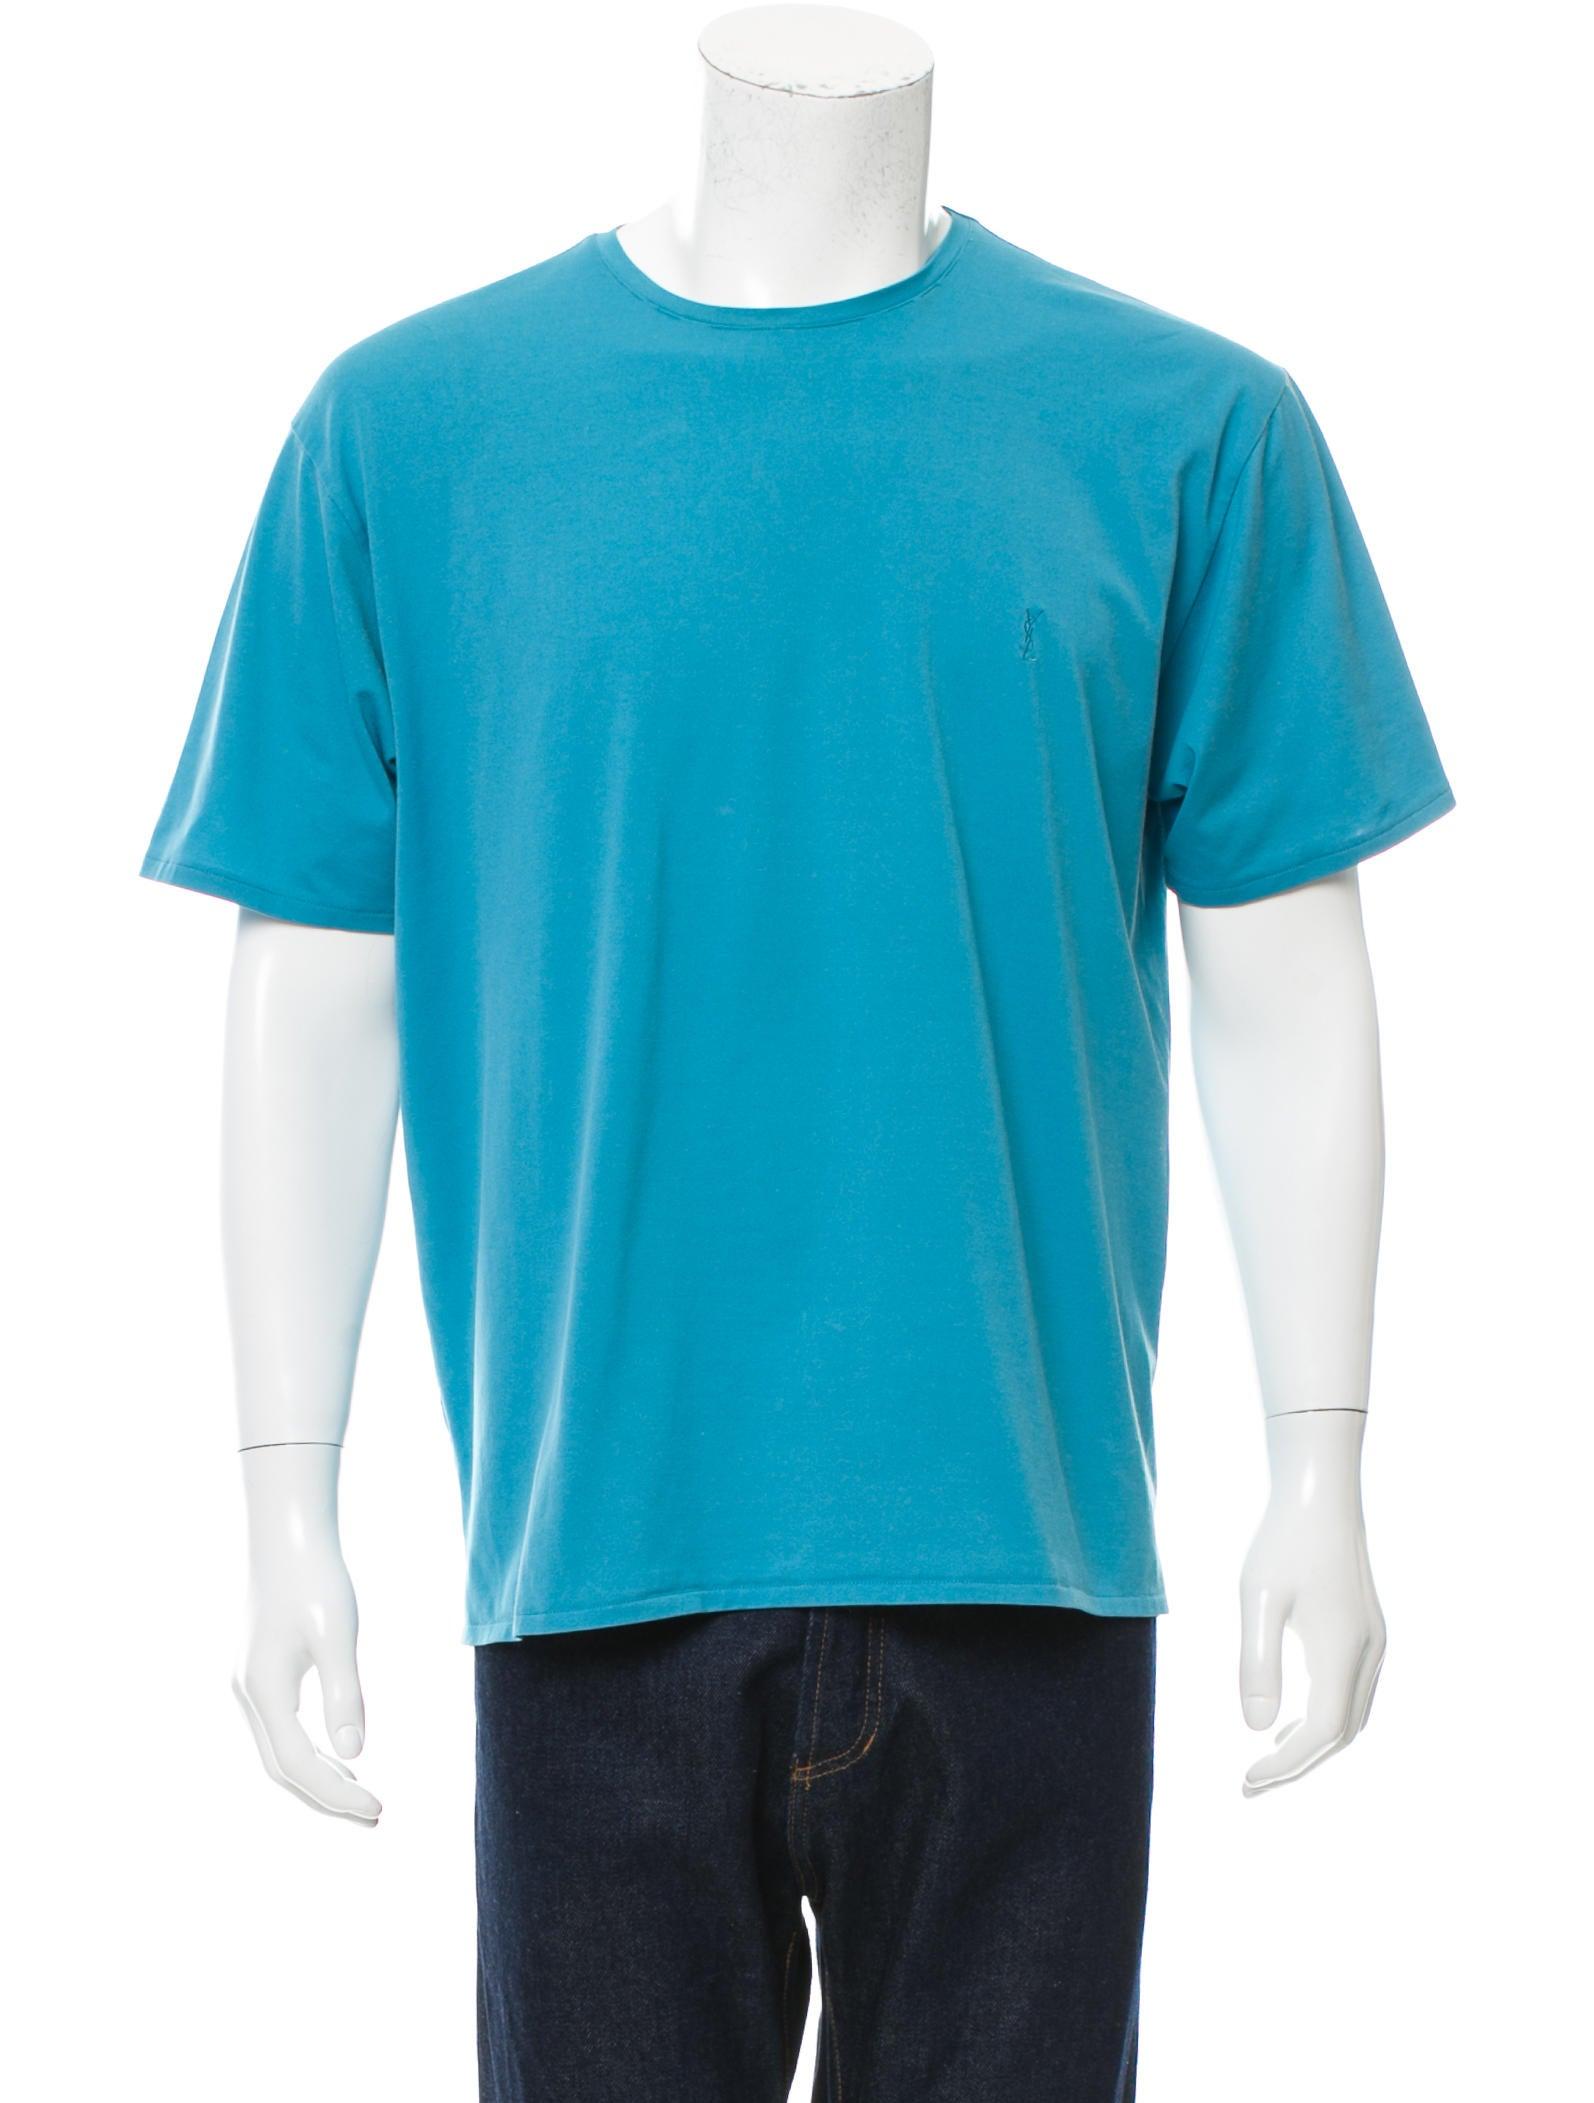 Yves saint laurent logo embroidered crew neck t shirt for Shirt with logo embroidered